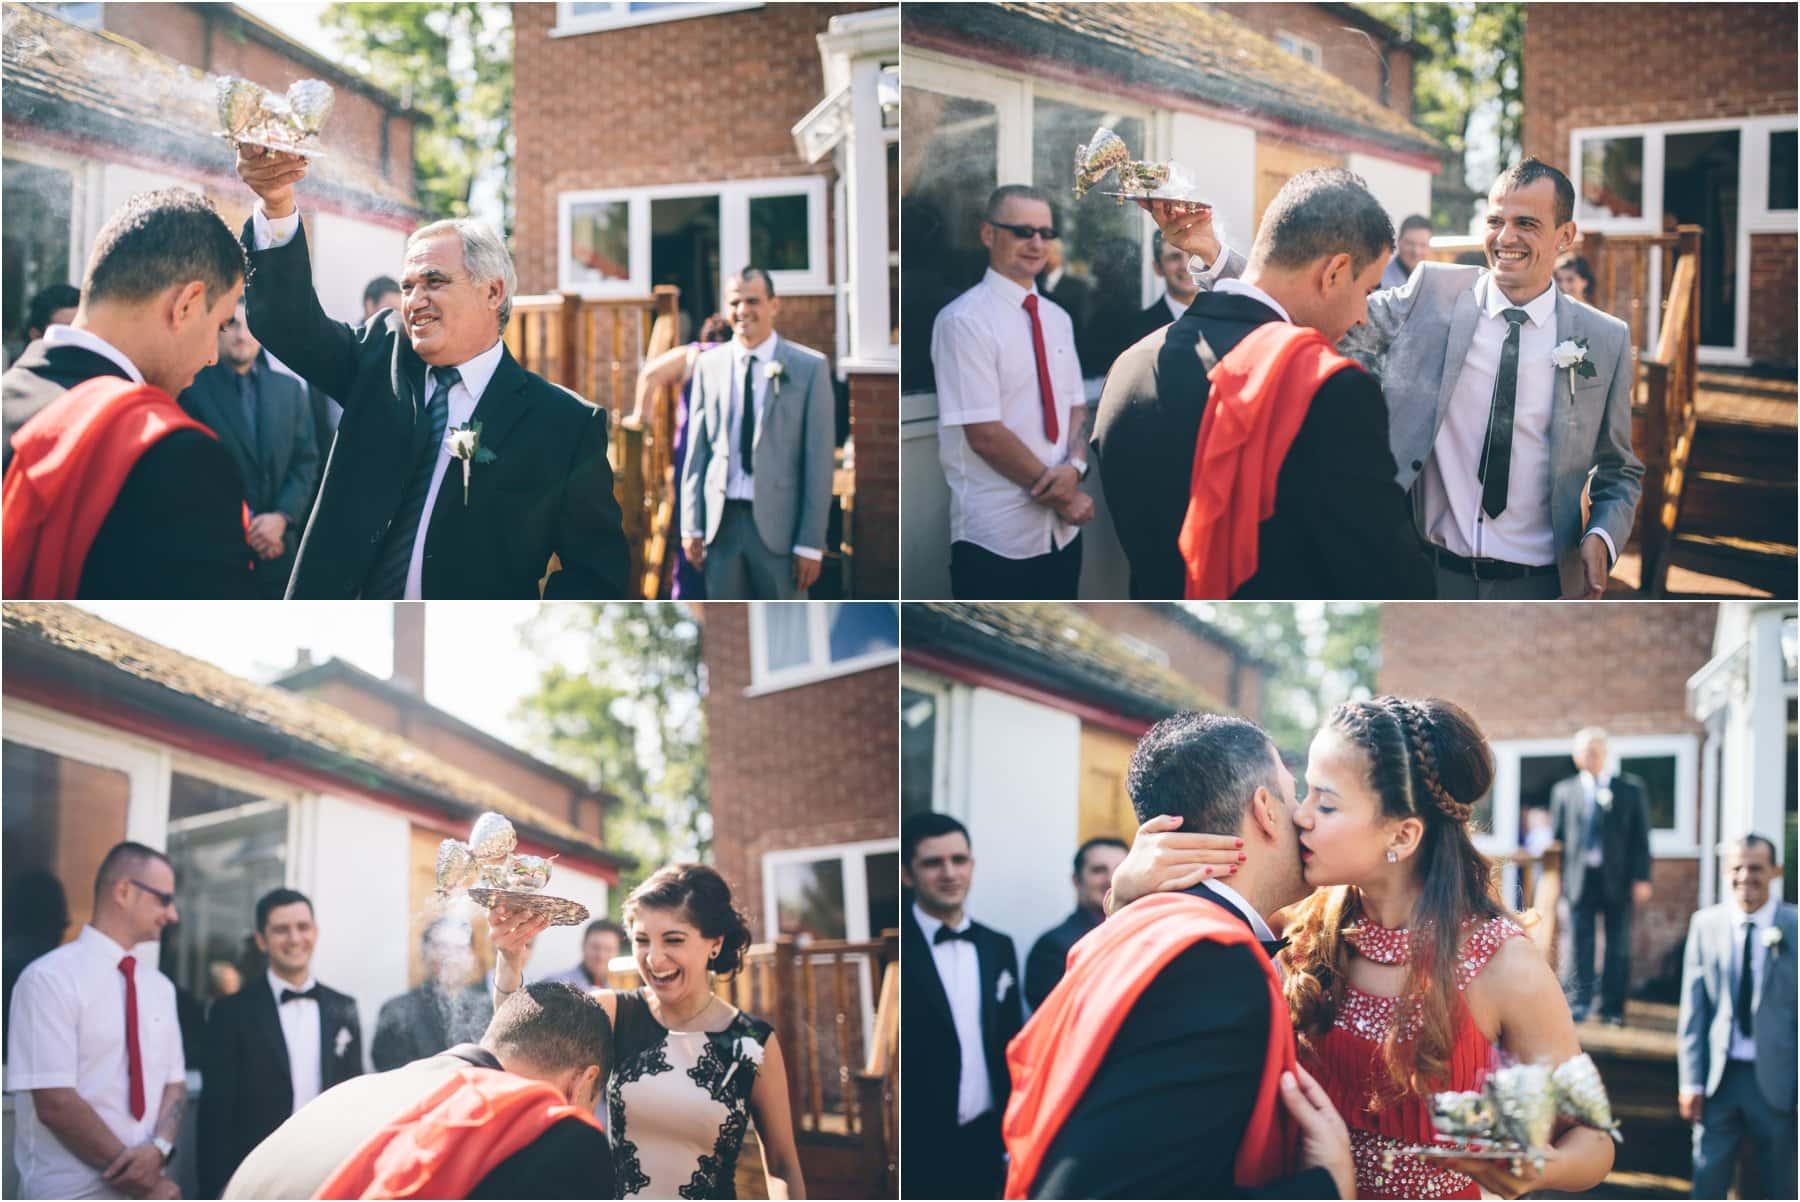 Midland_Manchester_Wedding_Photography_0012